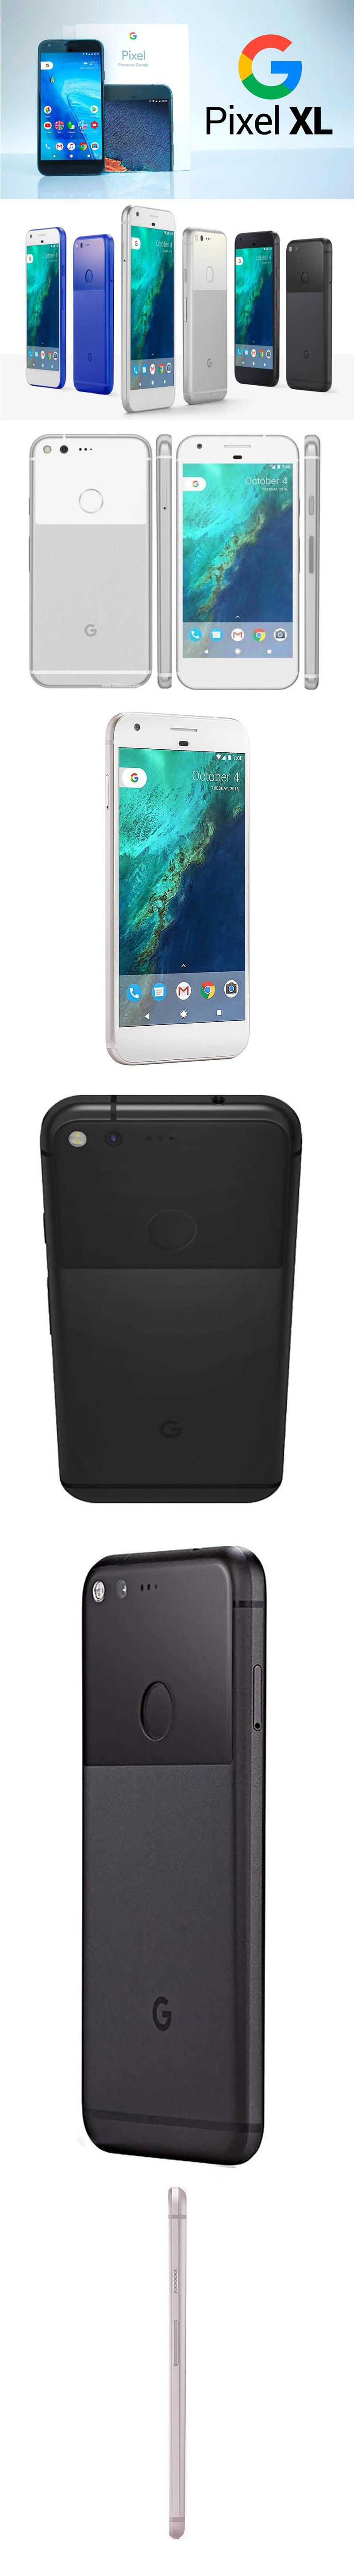 Google-Pixel-XL-Desc